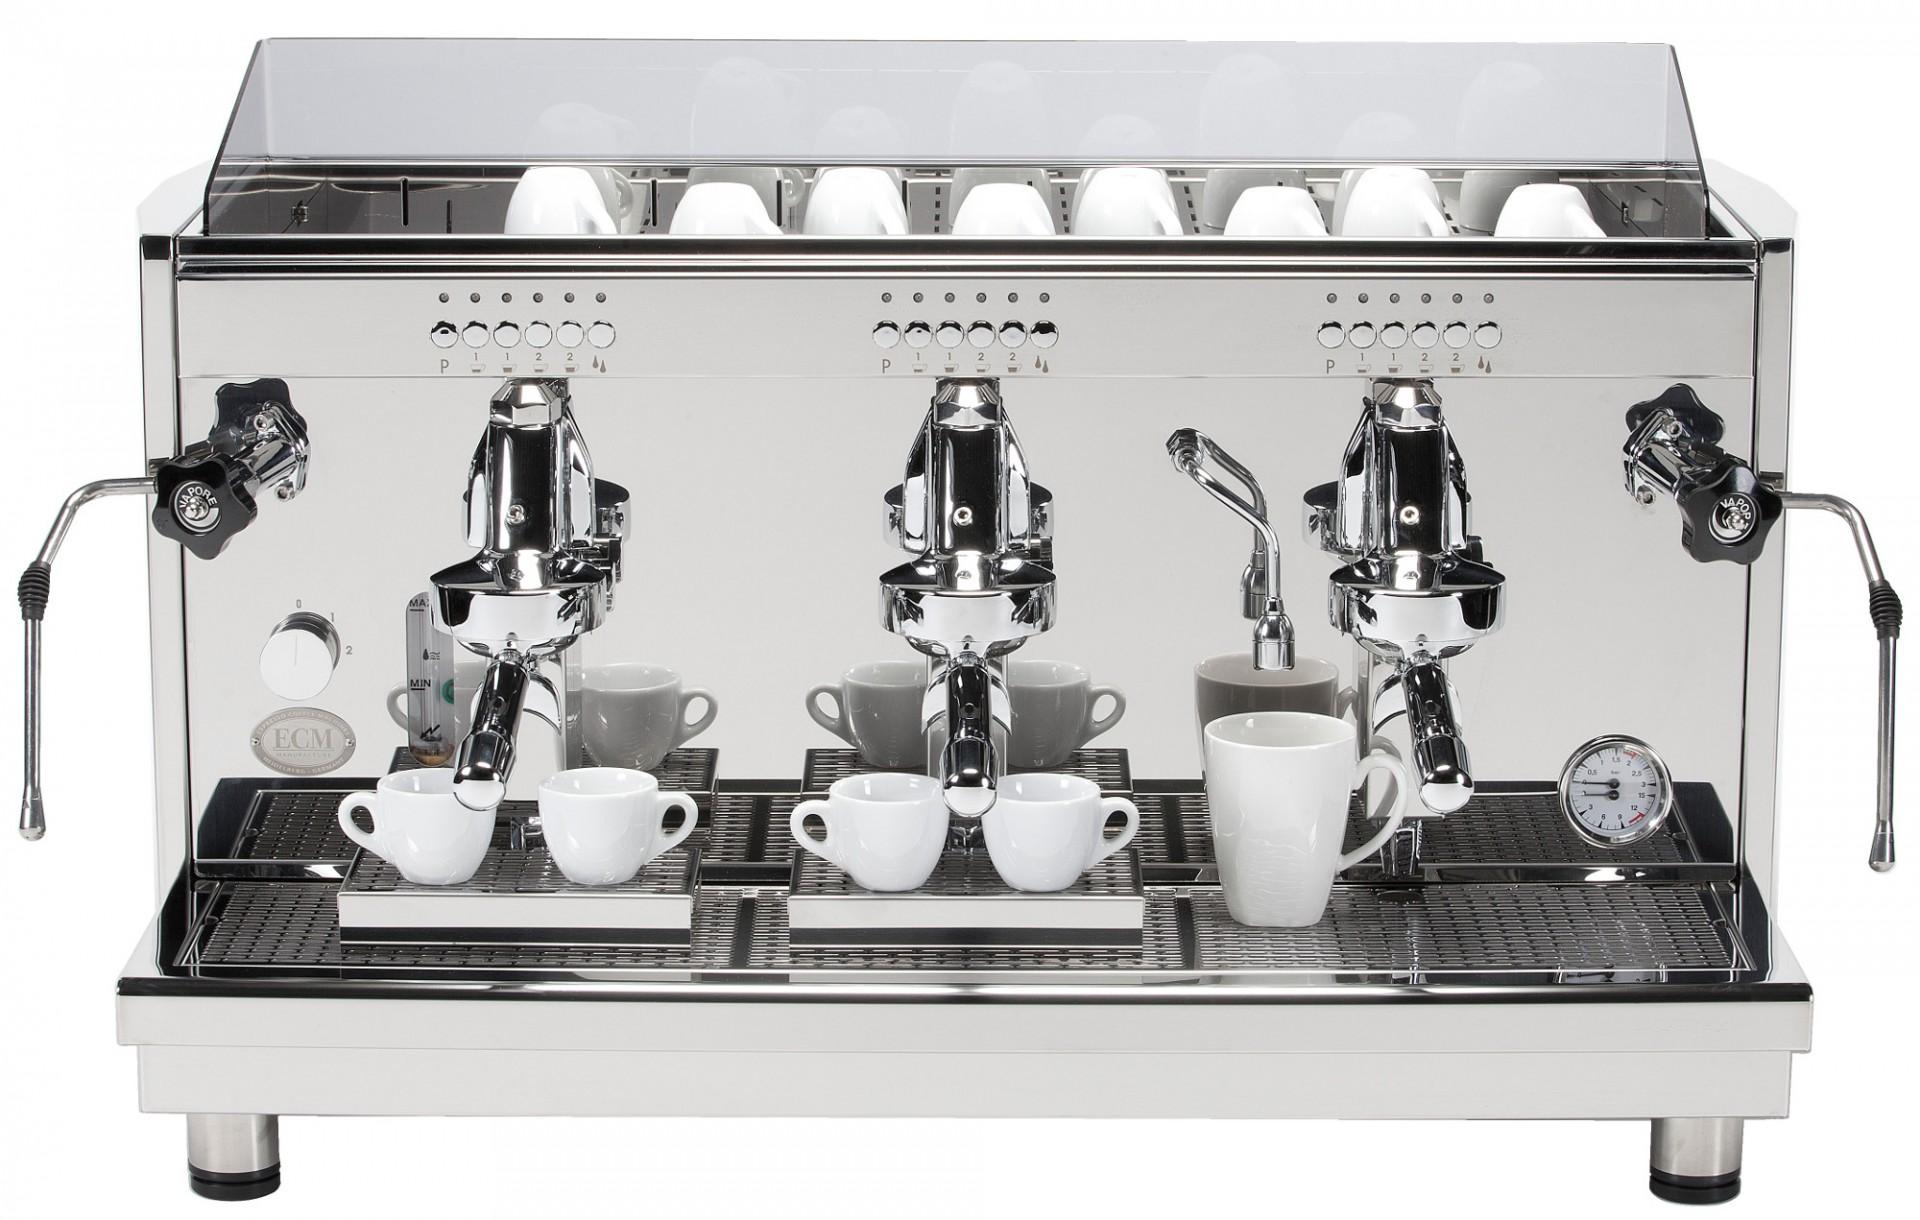 ECM Espresso Coffee Machines